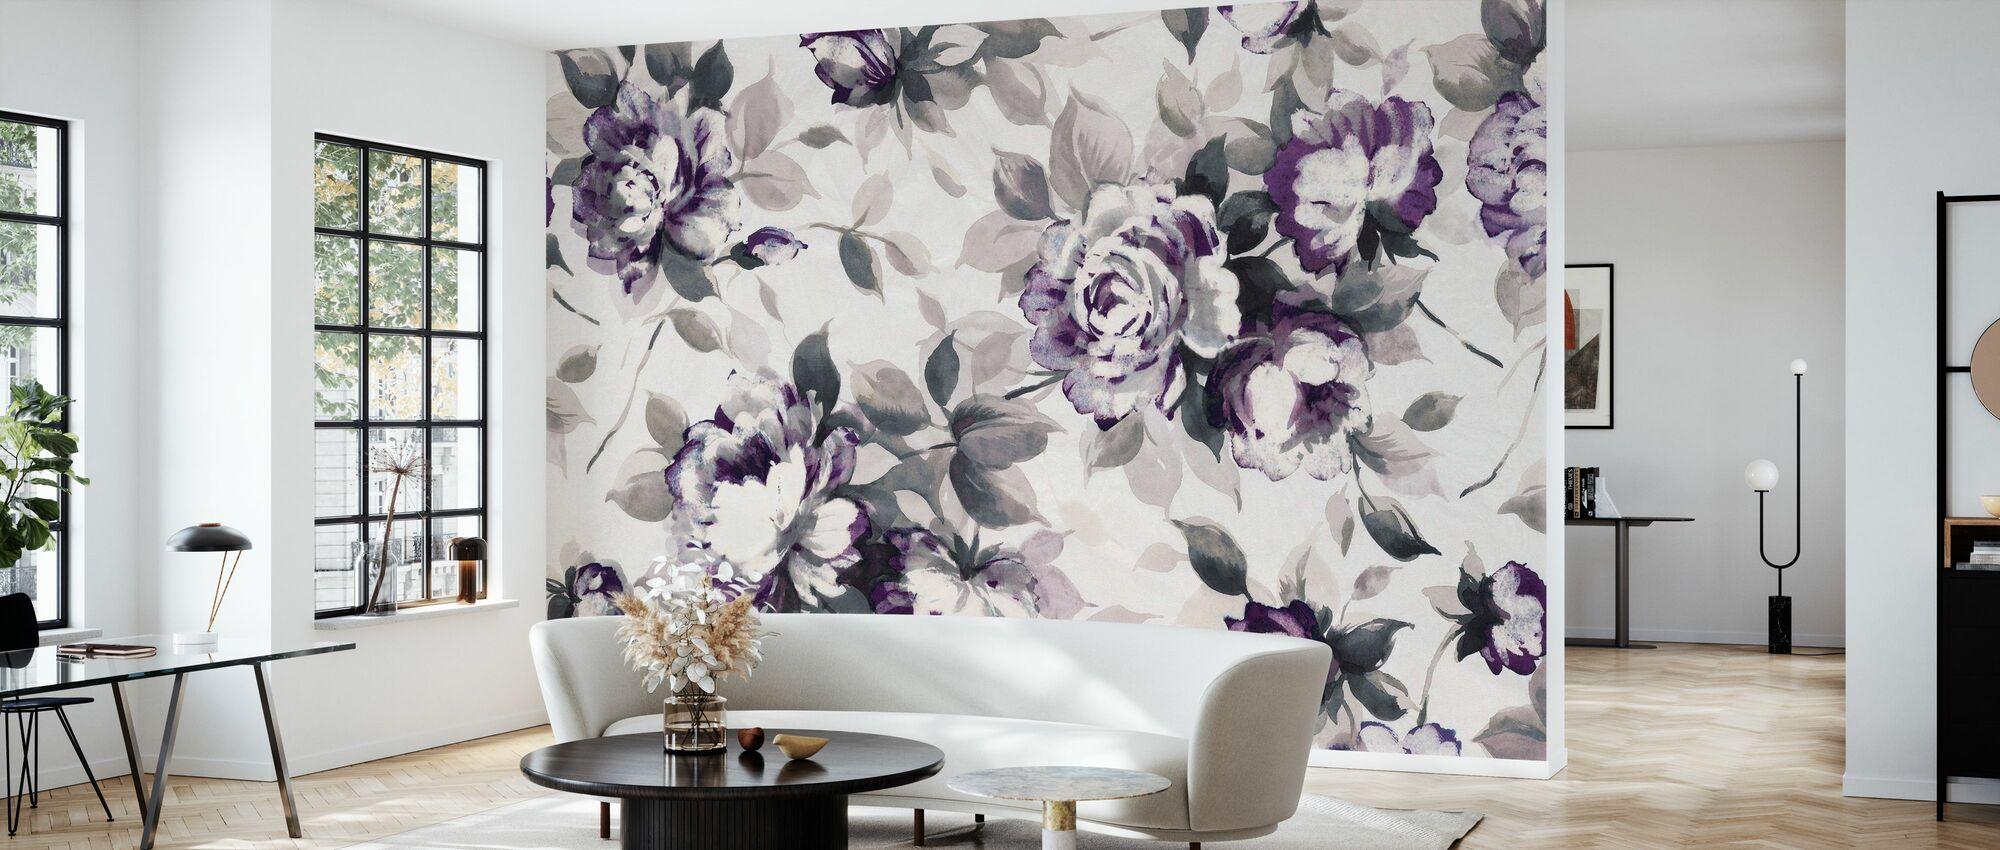 Scent of Roses Plum - Wallpaper - Living Room